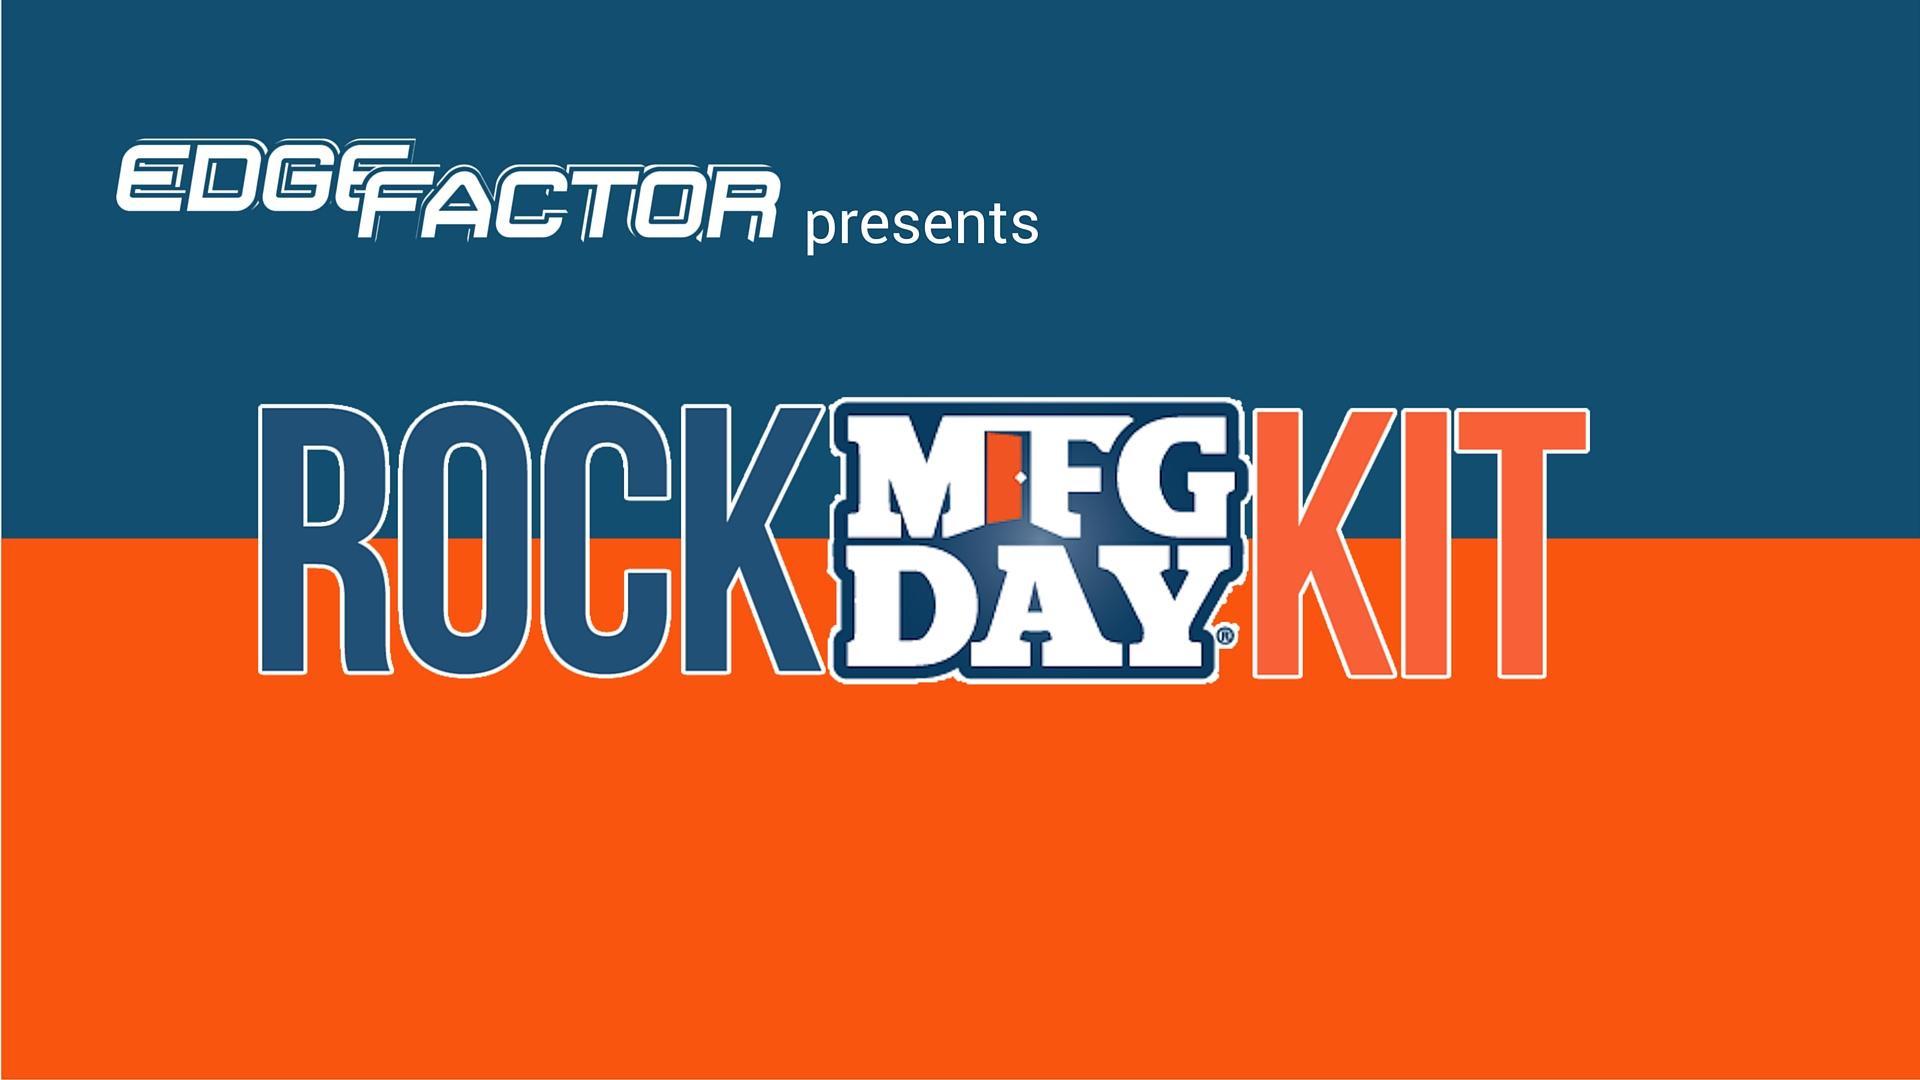 Edge Factor Rock MFG Day Experience STEAM kit